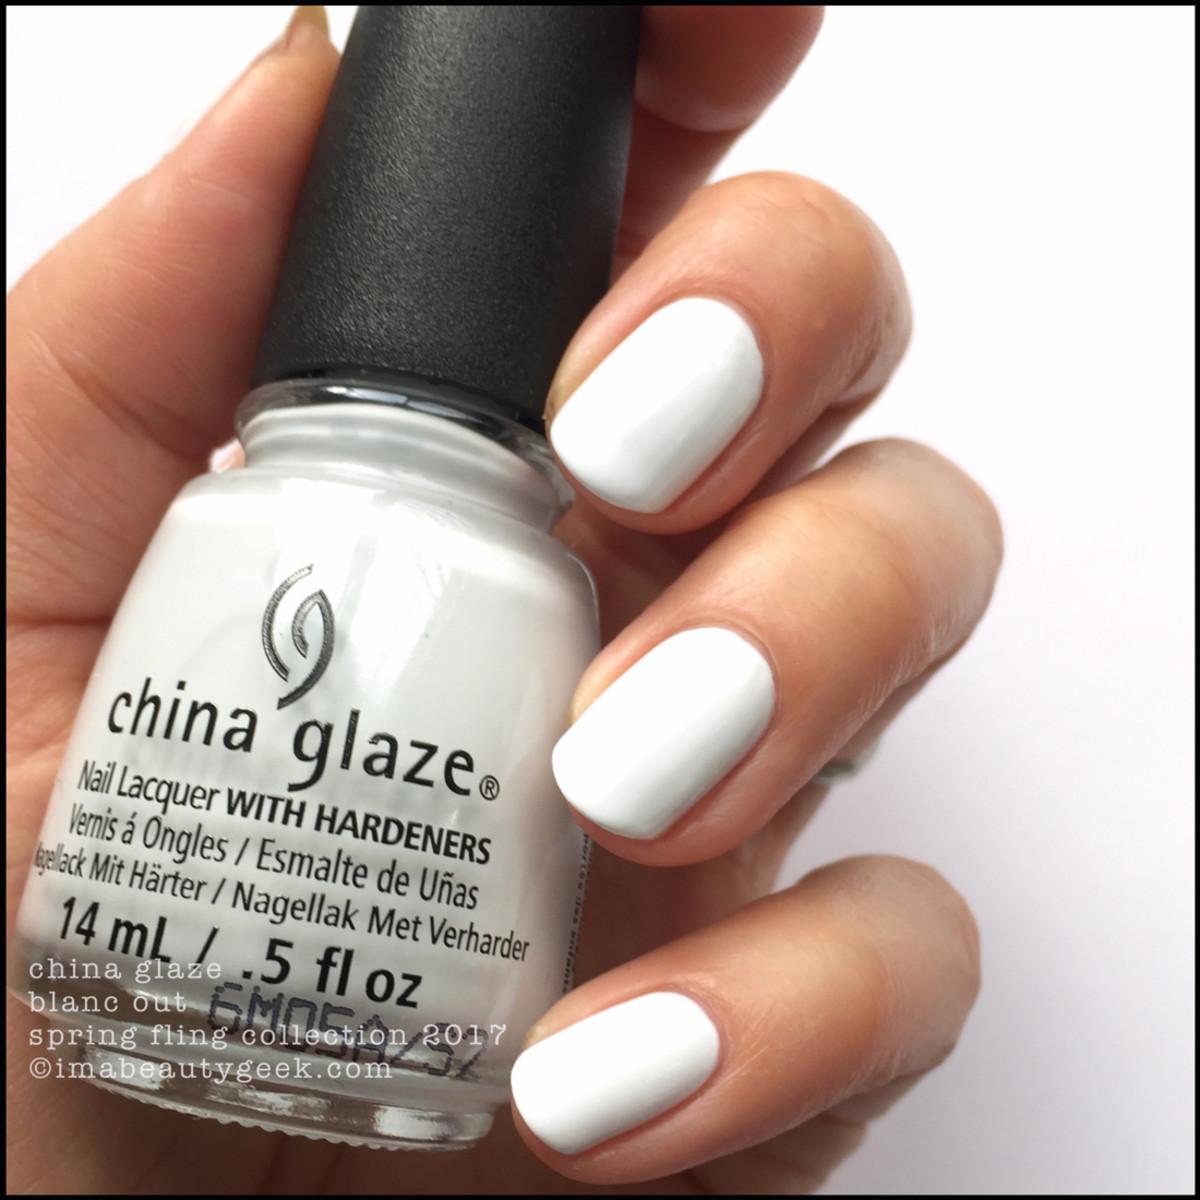 China Glaze Spring Fling 2017_China Glaze Blanc Out